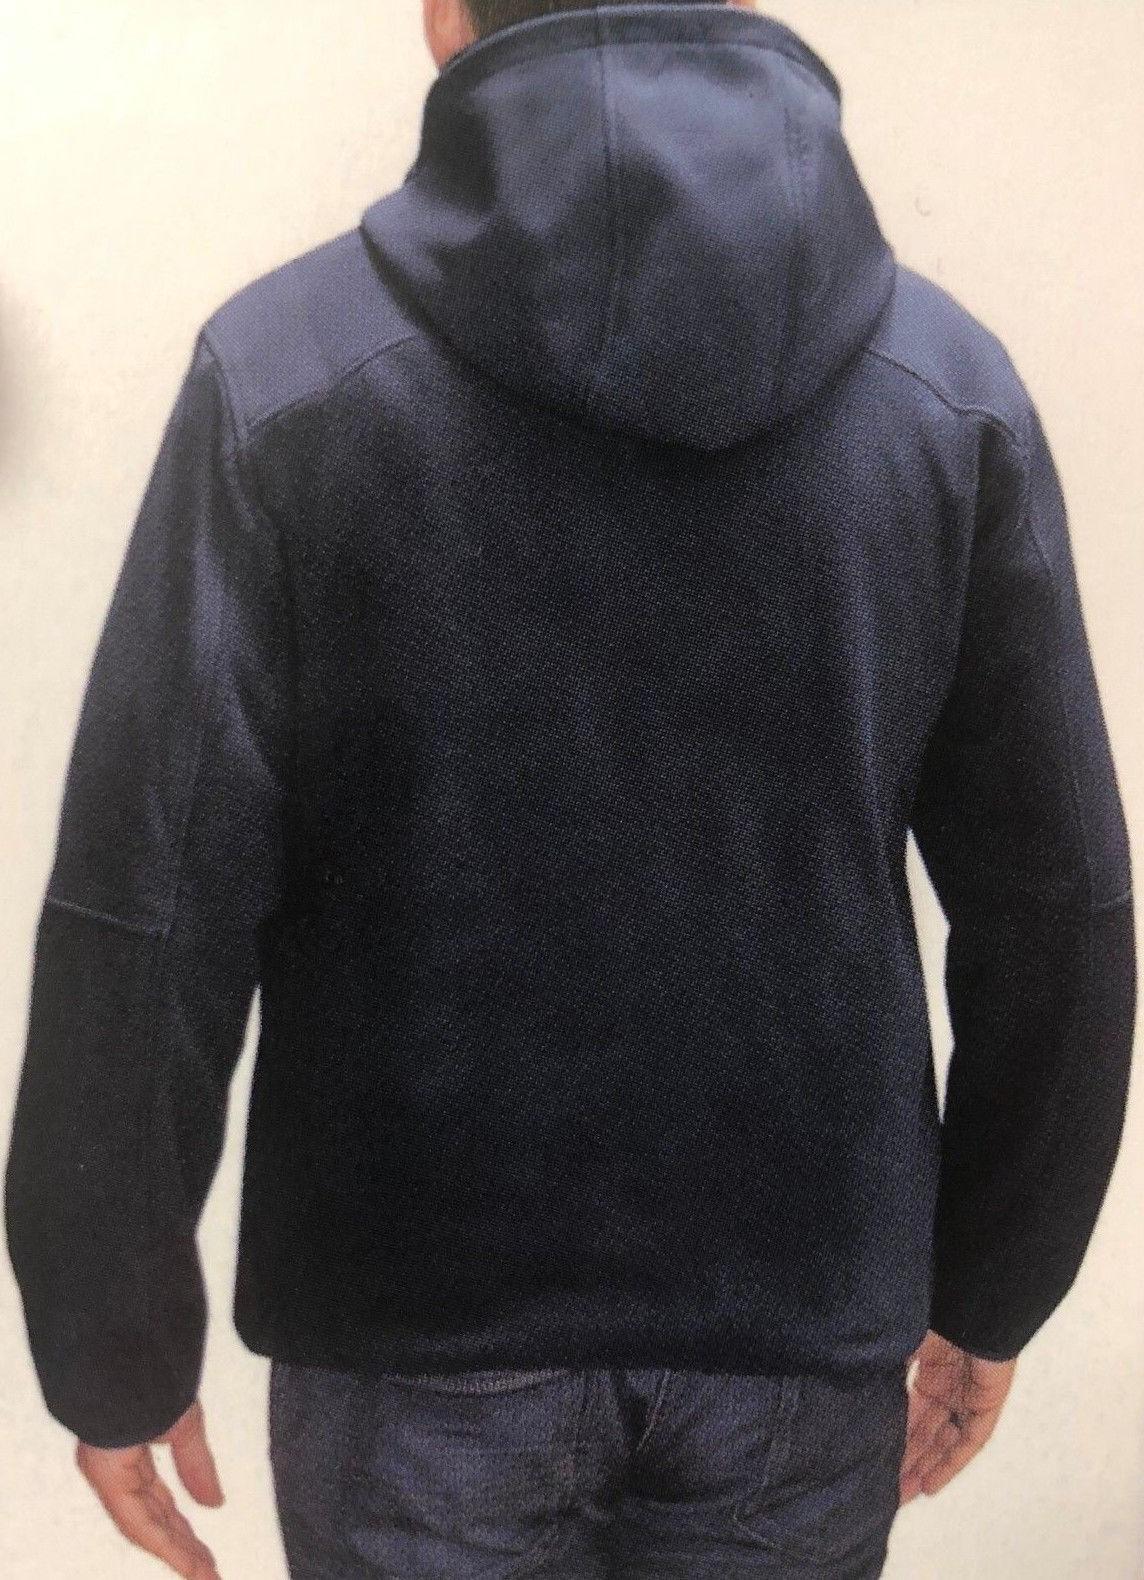 SALE! Reebok Soft Shell Fleece Hooded VARIETY SIZE & COLOR